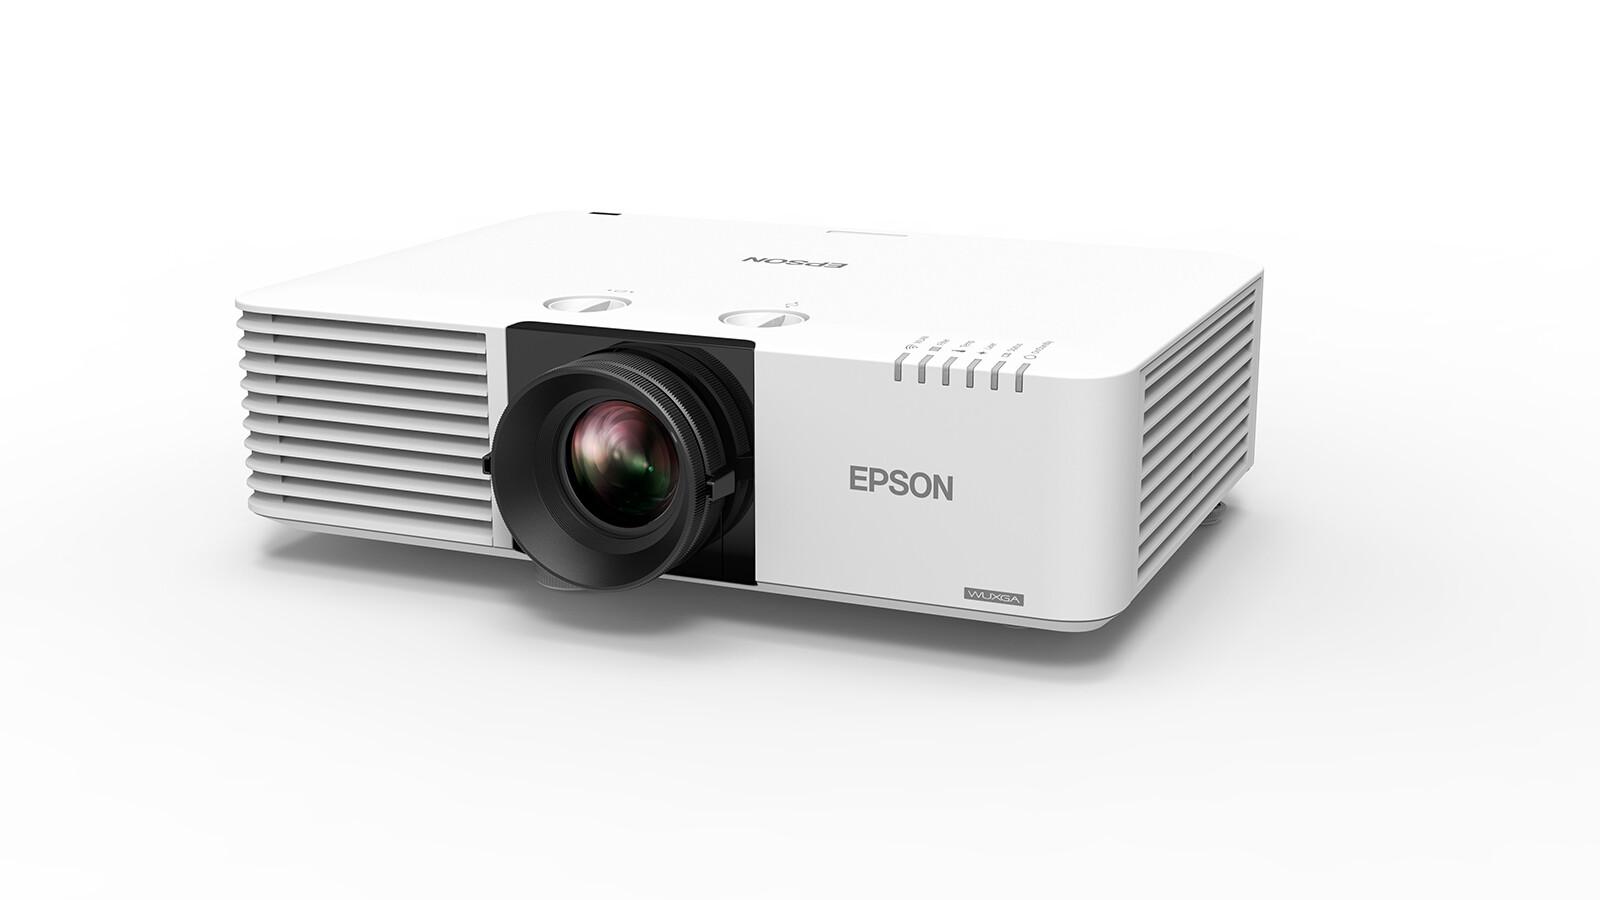 Epson EB-L610U LED Beamer | hier online kaufen